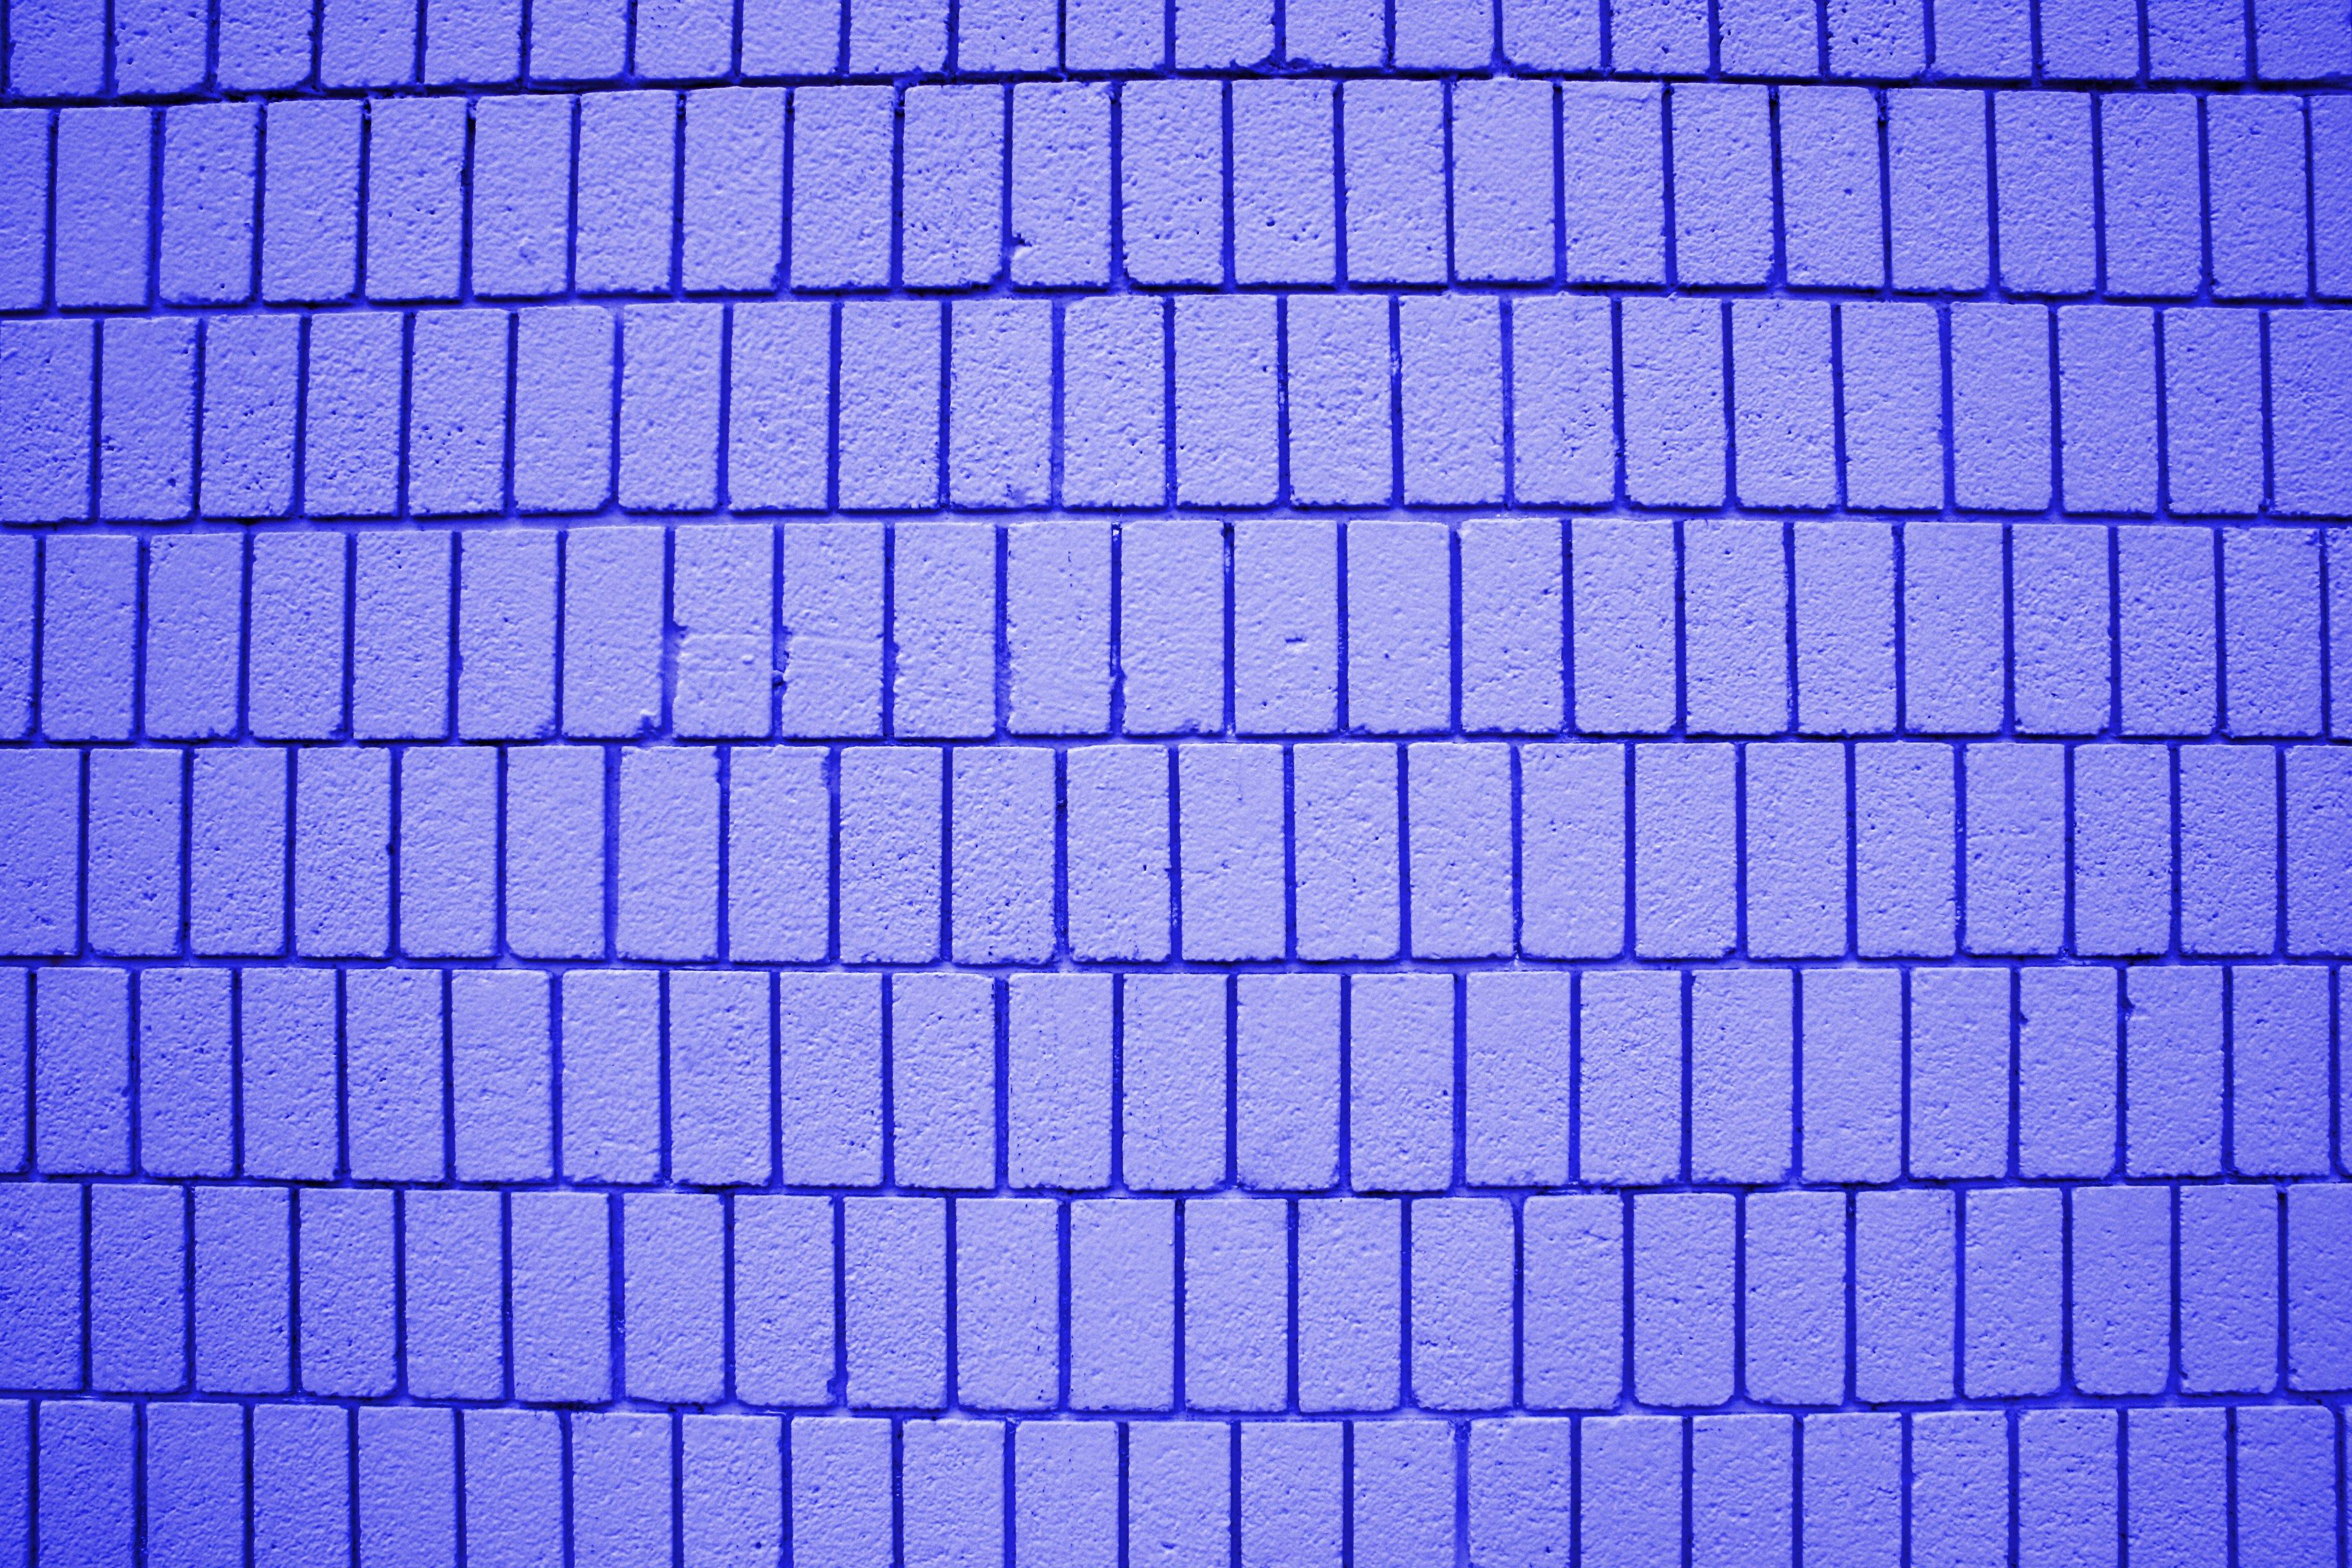 Indigo Blue Brick Wall Texture With Vertical Bricks